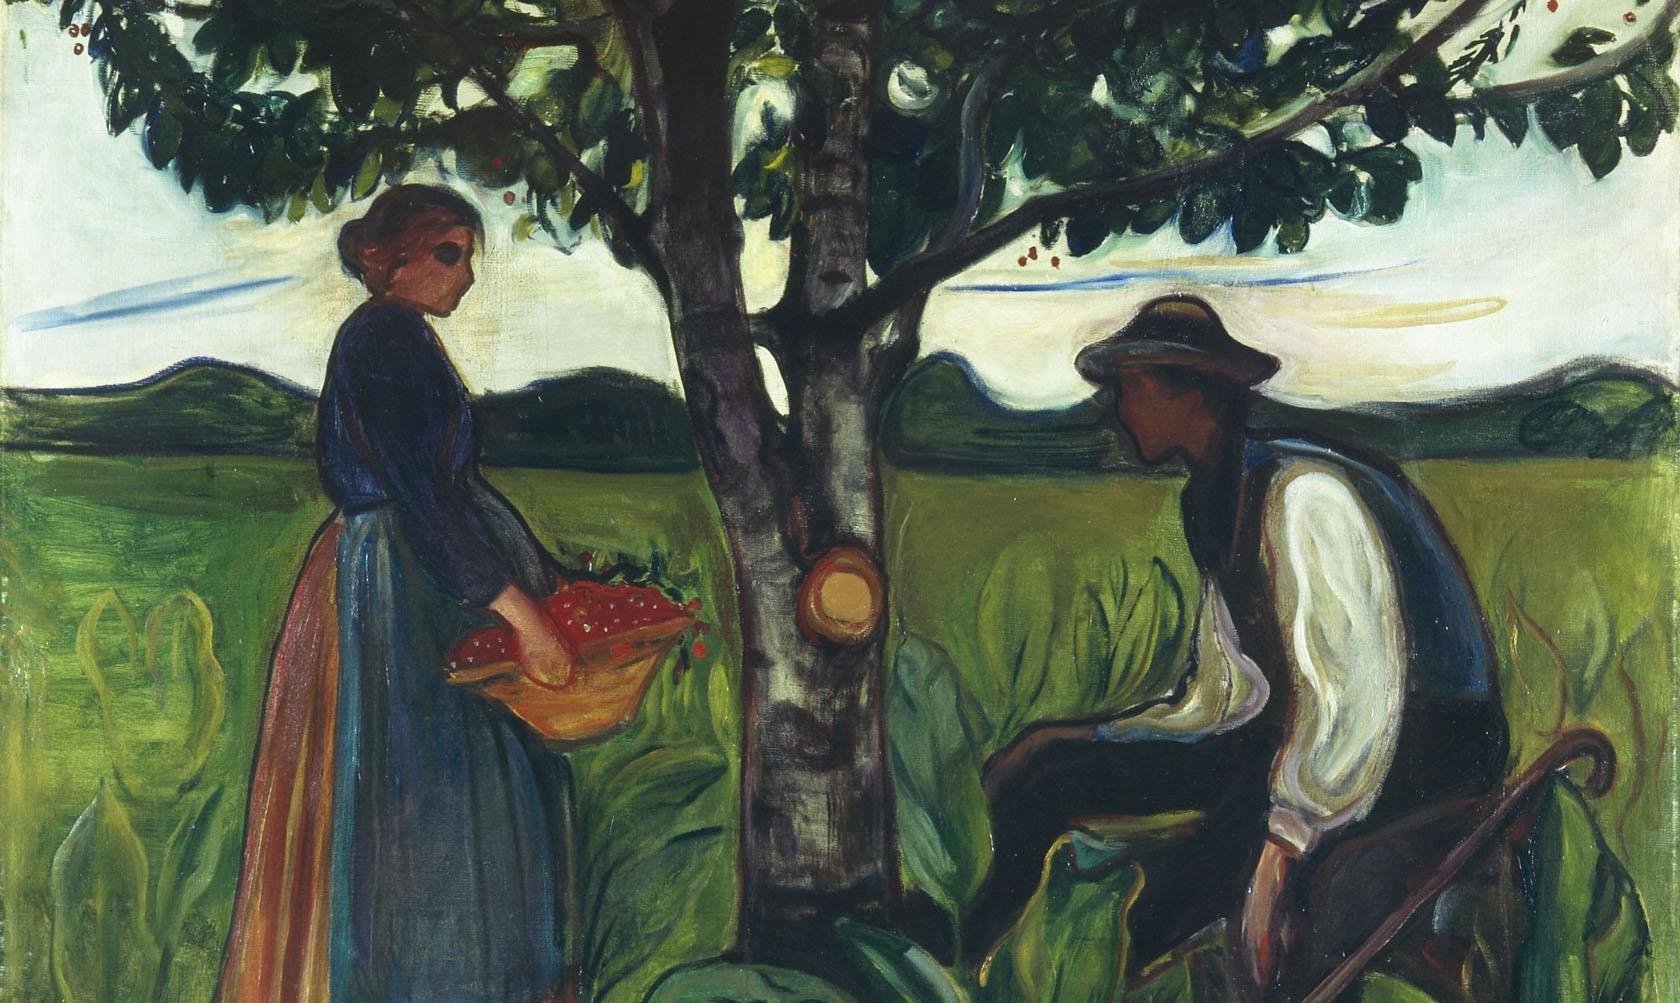 Edvard-Munch-Vruchtbaarheid-detail-1899-1900-Canica-Kunstcollectie